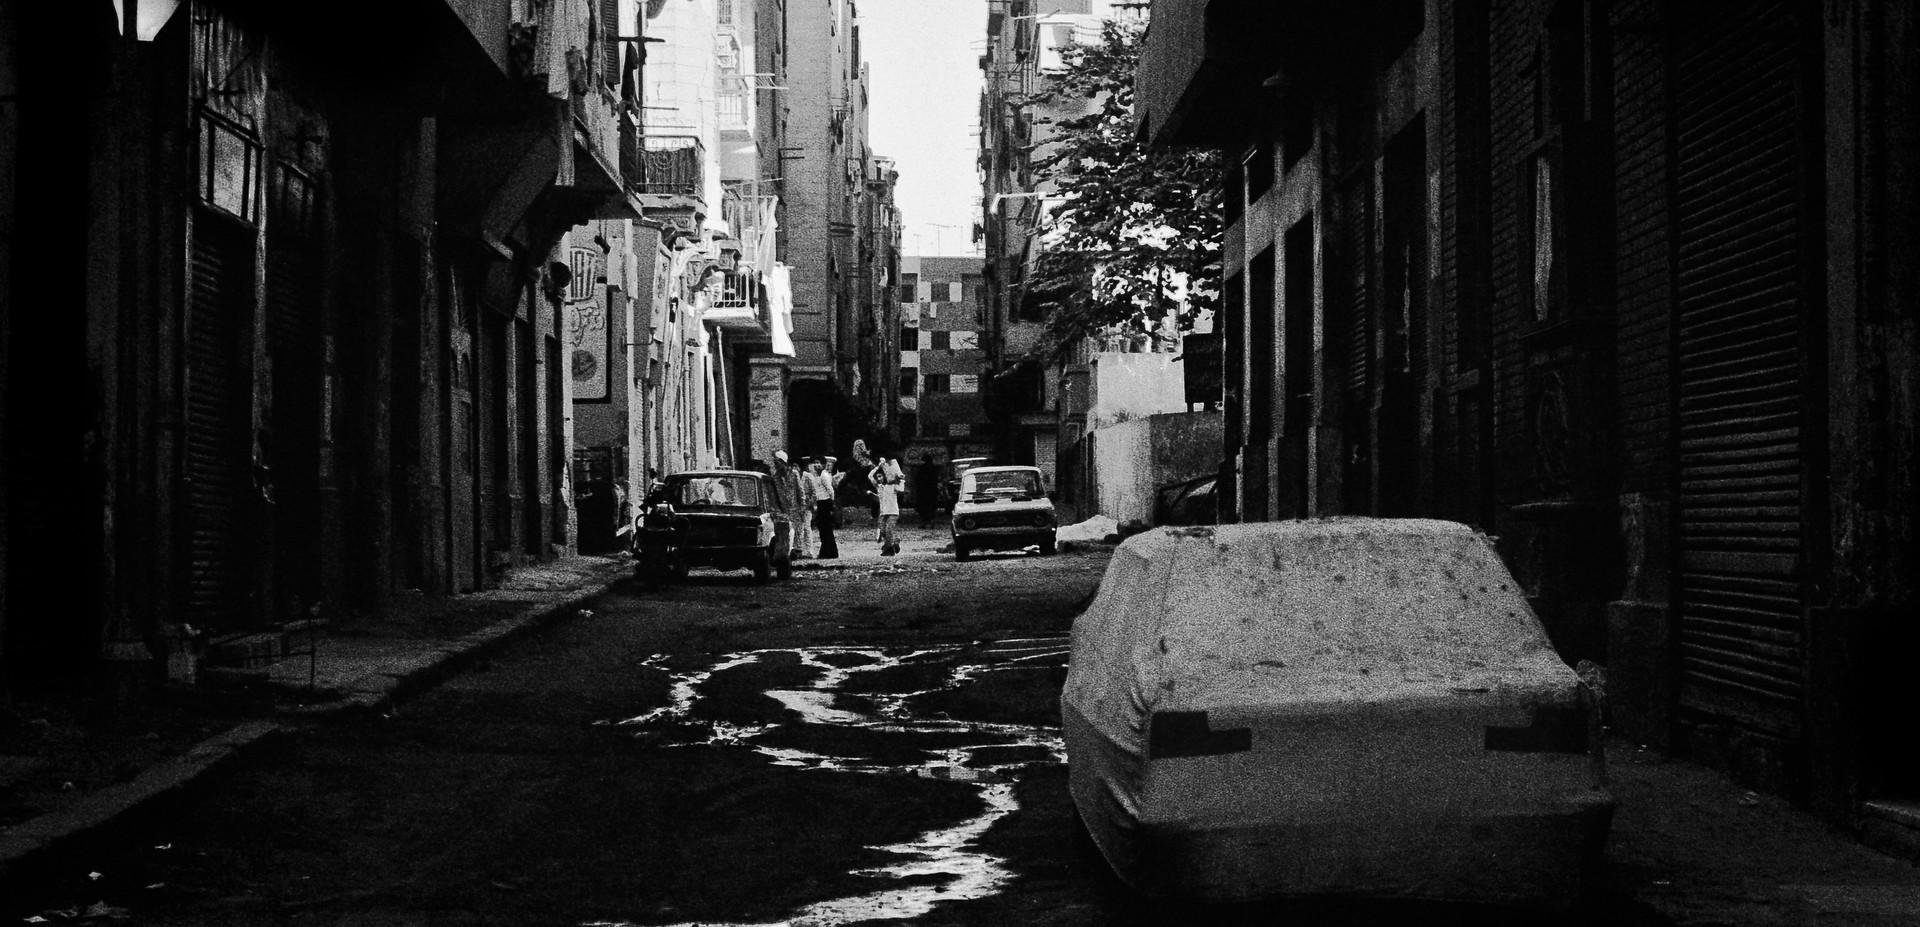 Cairo, Egypt 1980